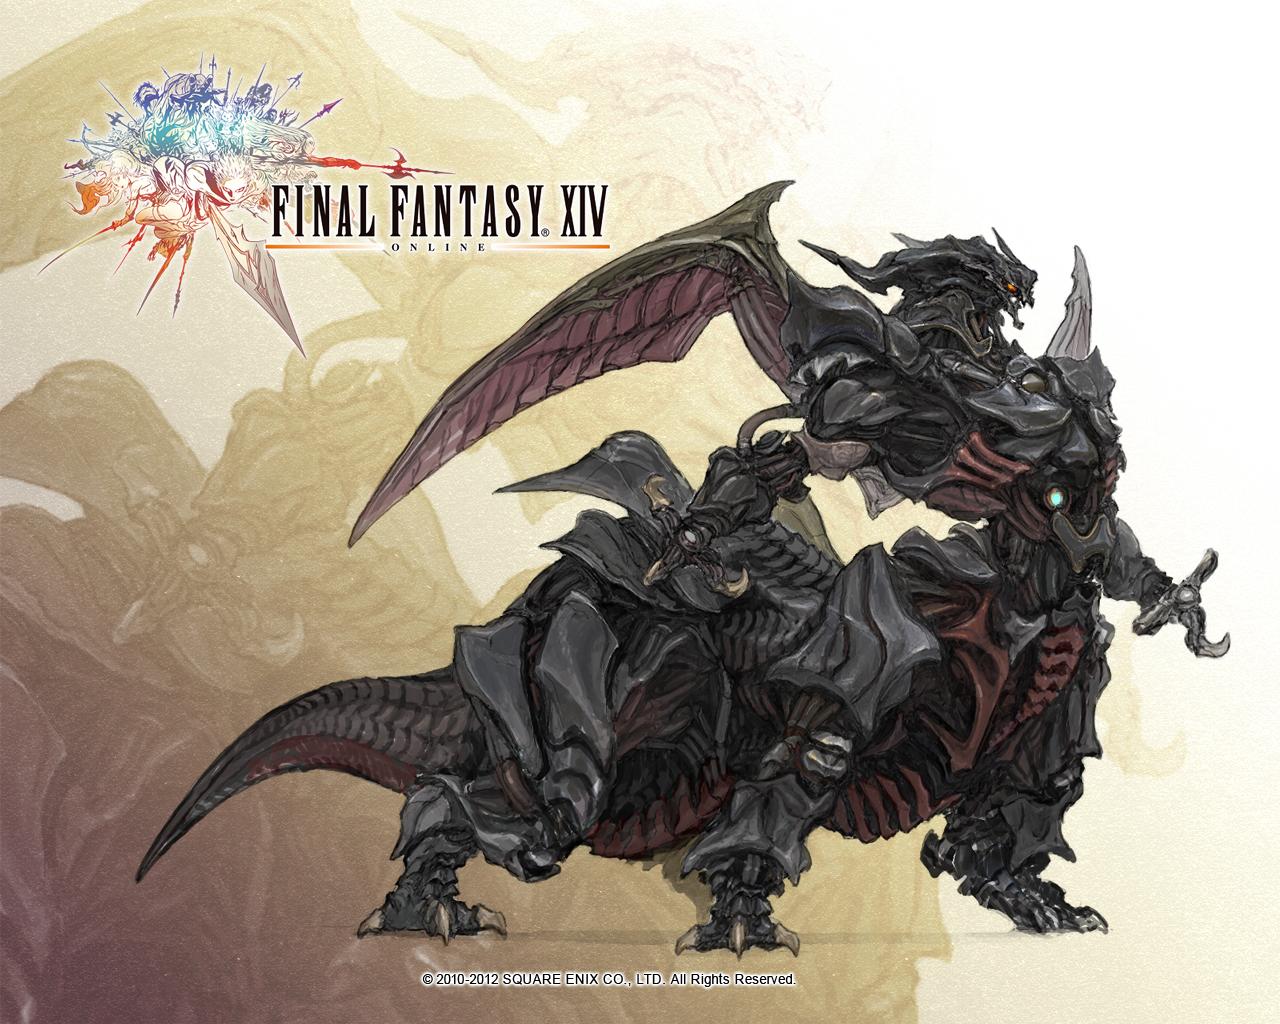 Final Fantasy Xiv Wallpapers Final Fantasy Wiki Fandom